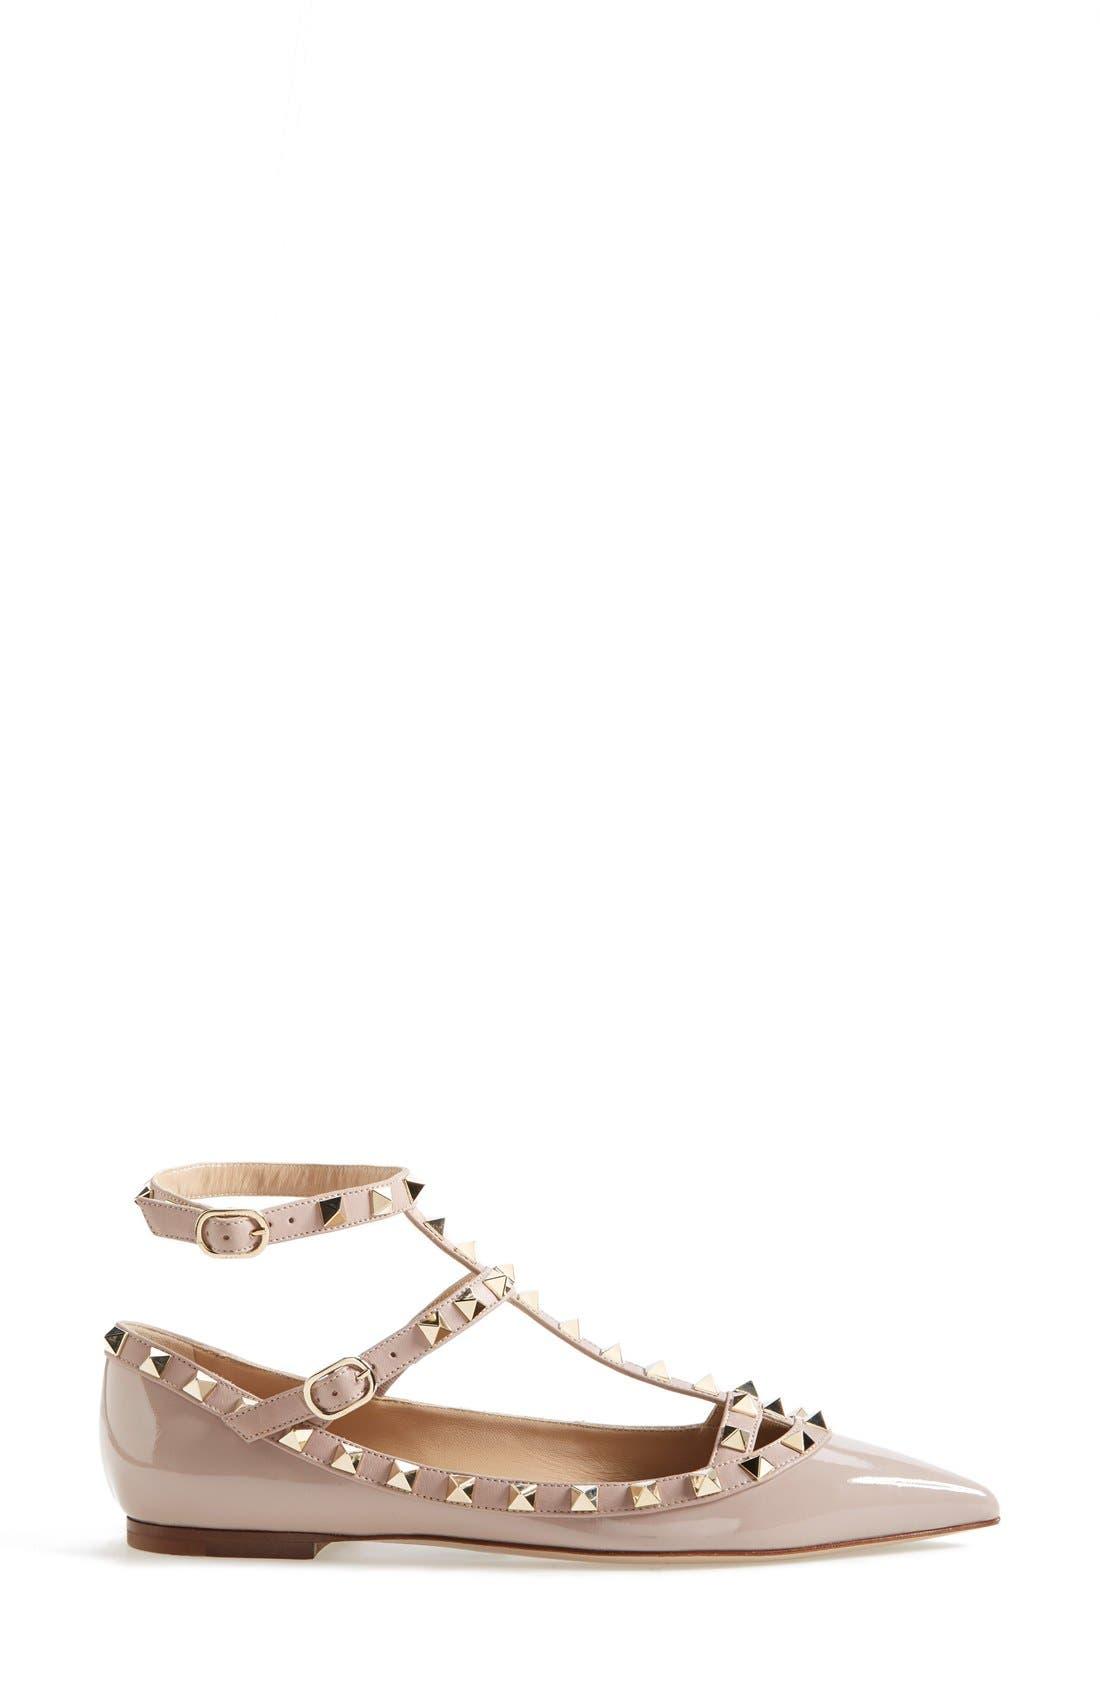 Alternate Image 4  - Valentino 'Rockstud' Patent Leather T-Strap Ballerina Flat (Women)